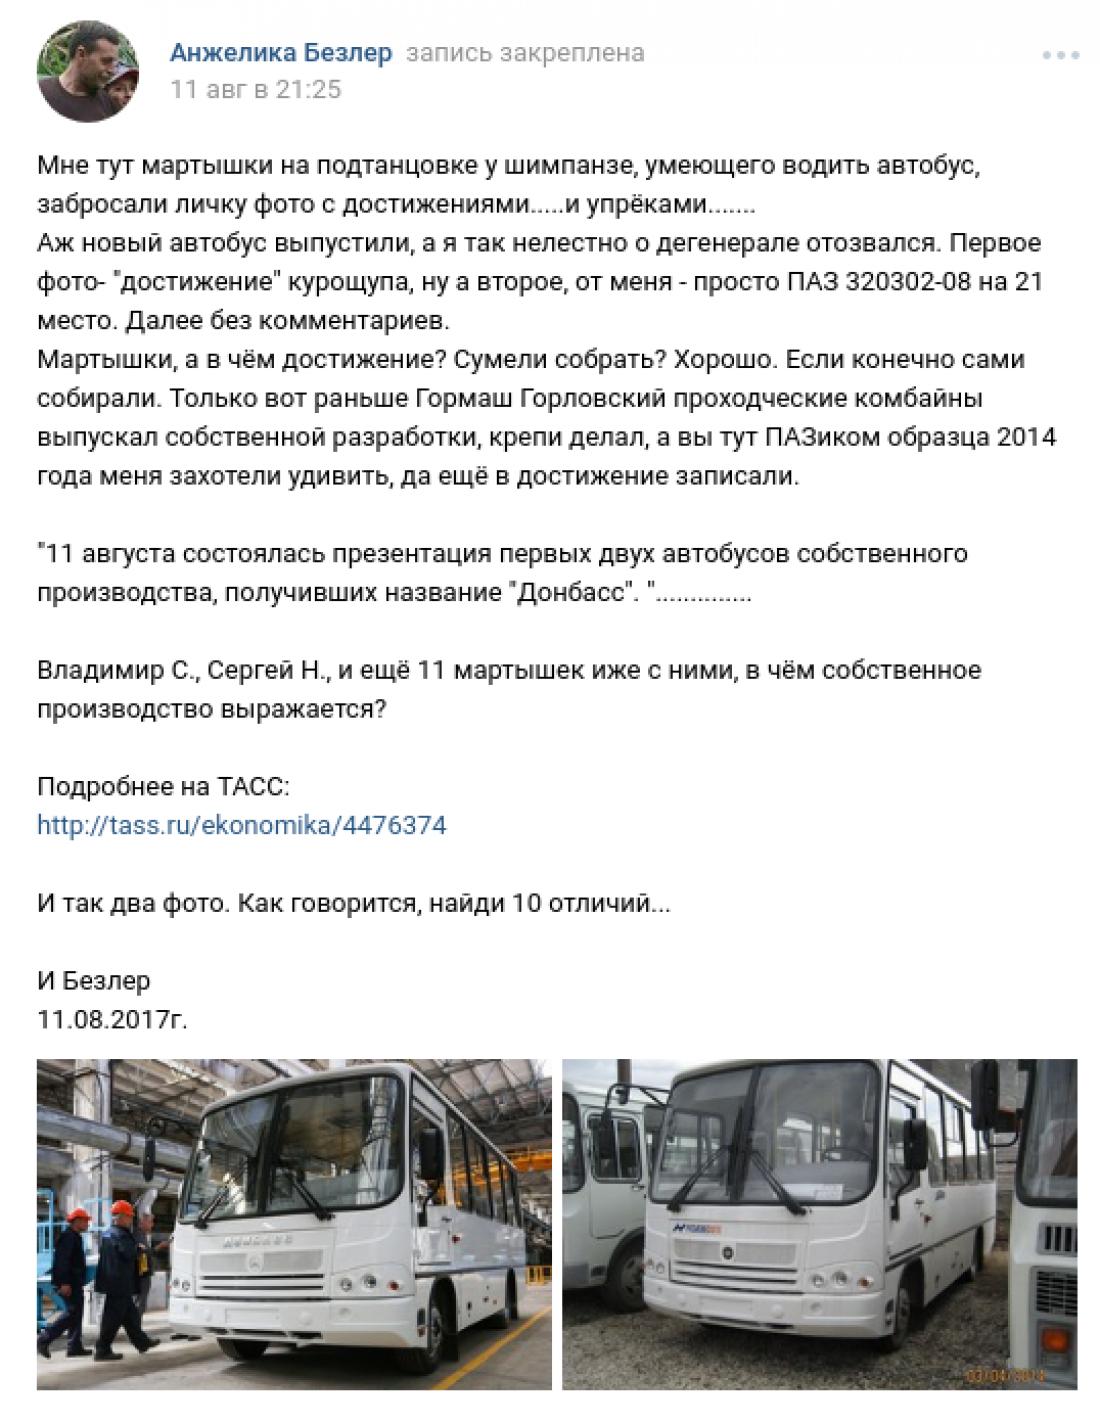 Безлер высмеял Захарченко